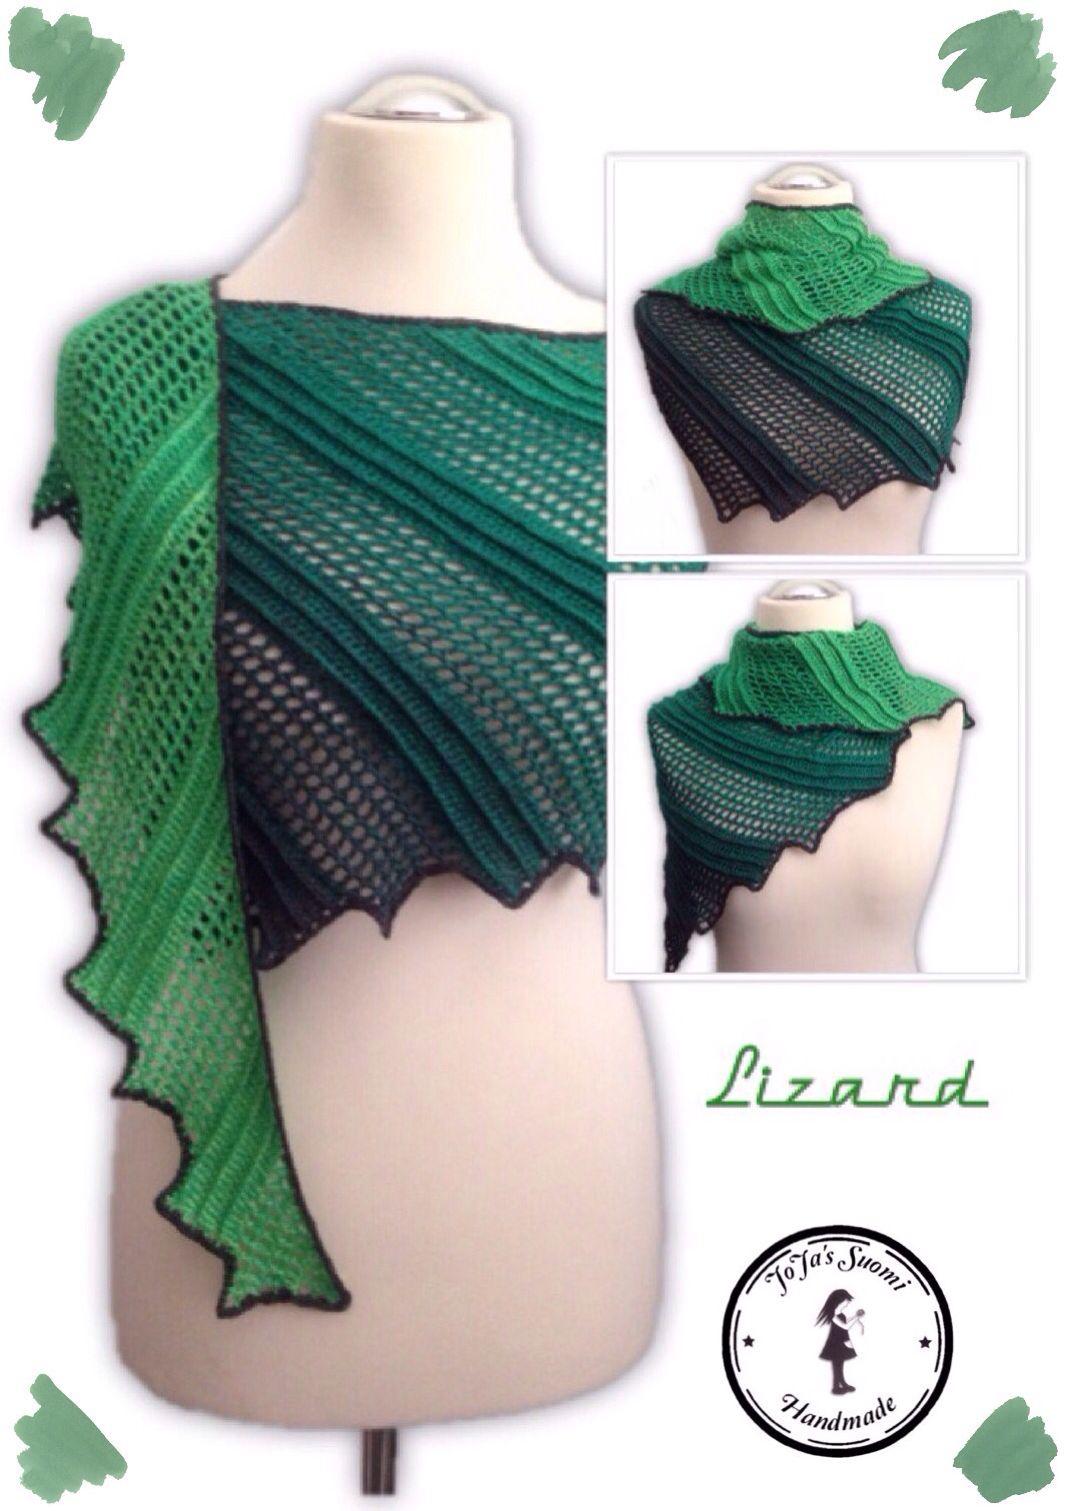 Lizard #crochet #pattern | Morben Design | Pinterest | Häkeln ...